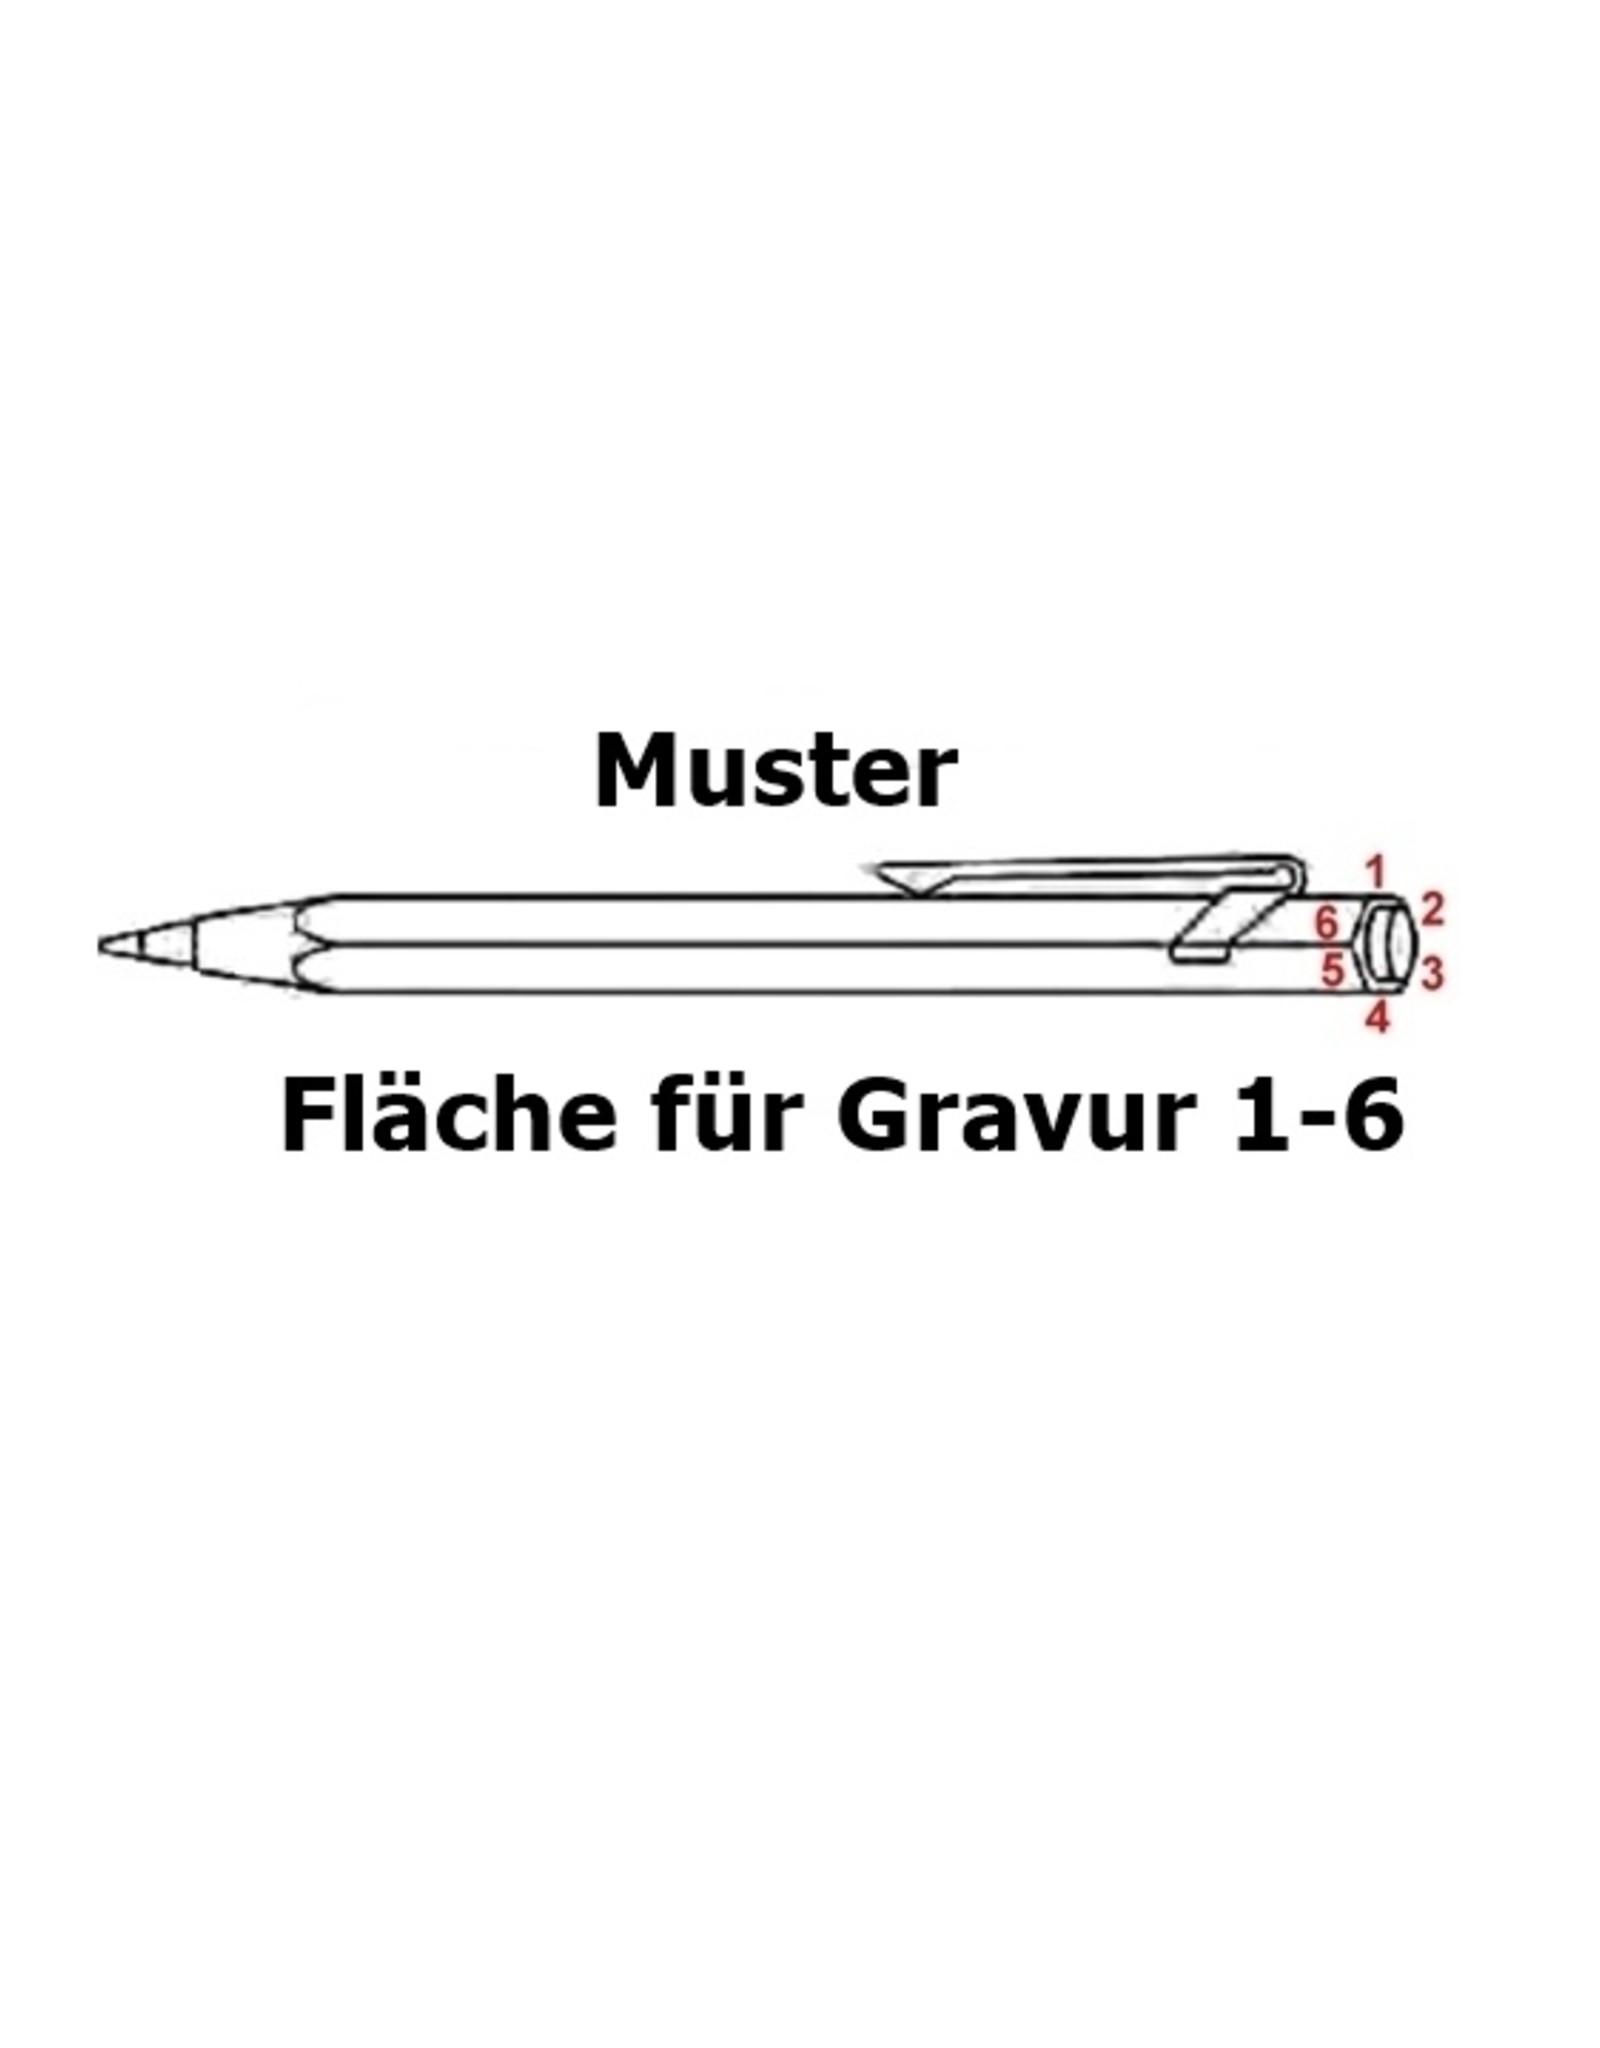 Kollektion silber Kugelschreiber mit Gravur